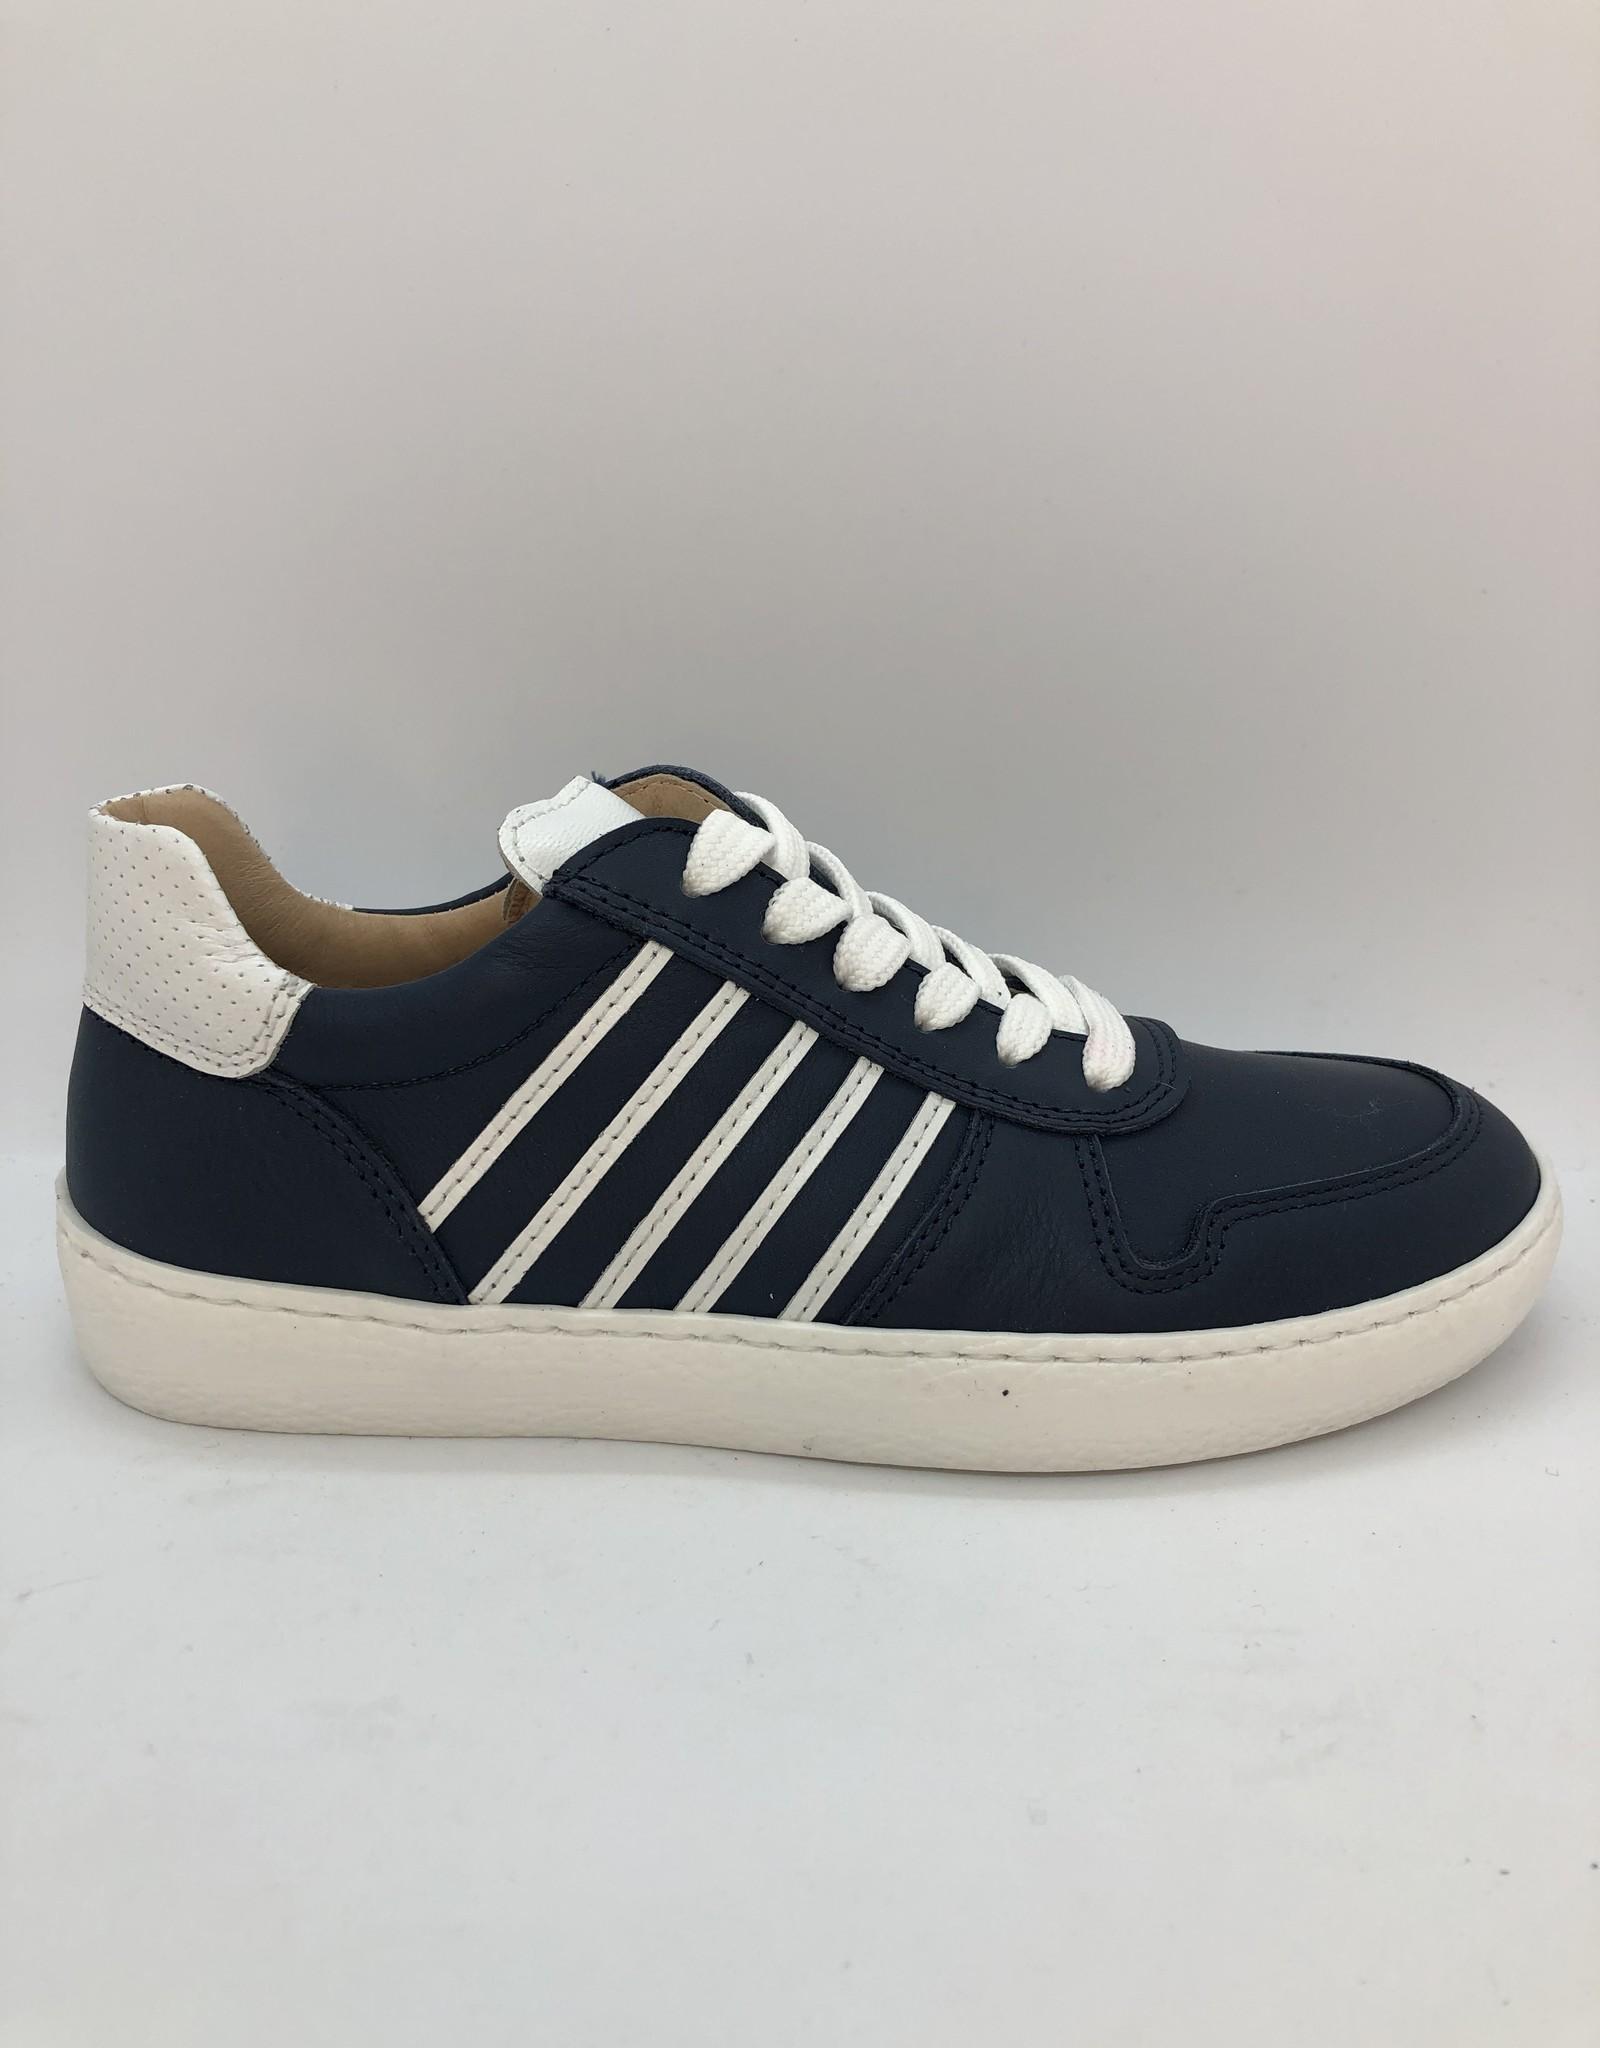 Lunella 21325 blauwe sneaker wit accent